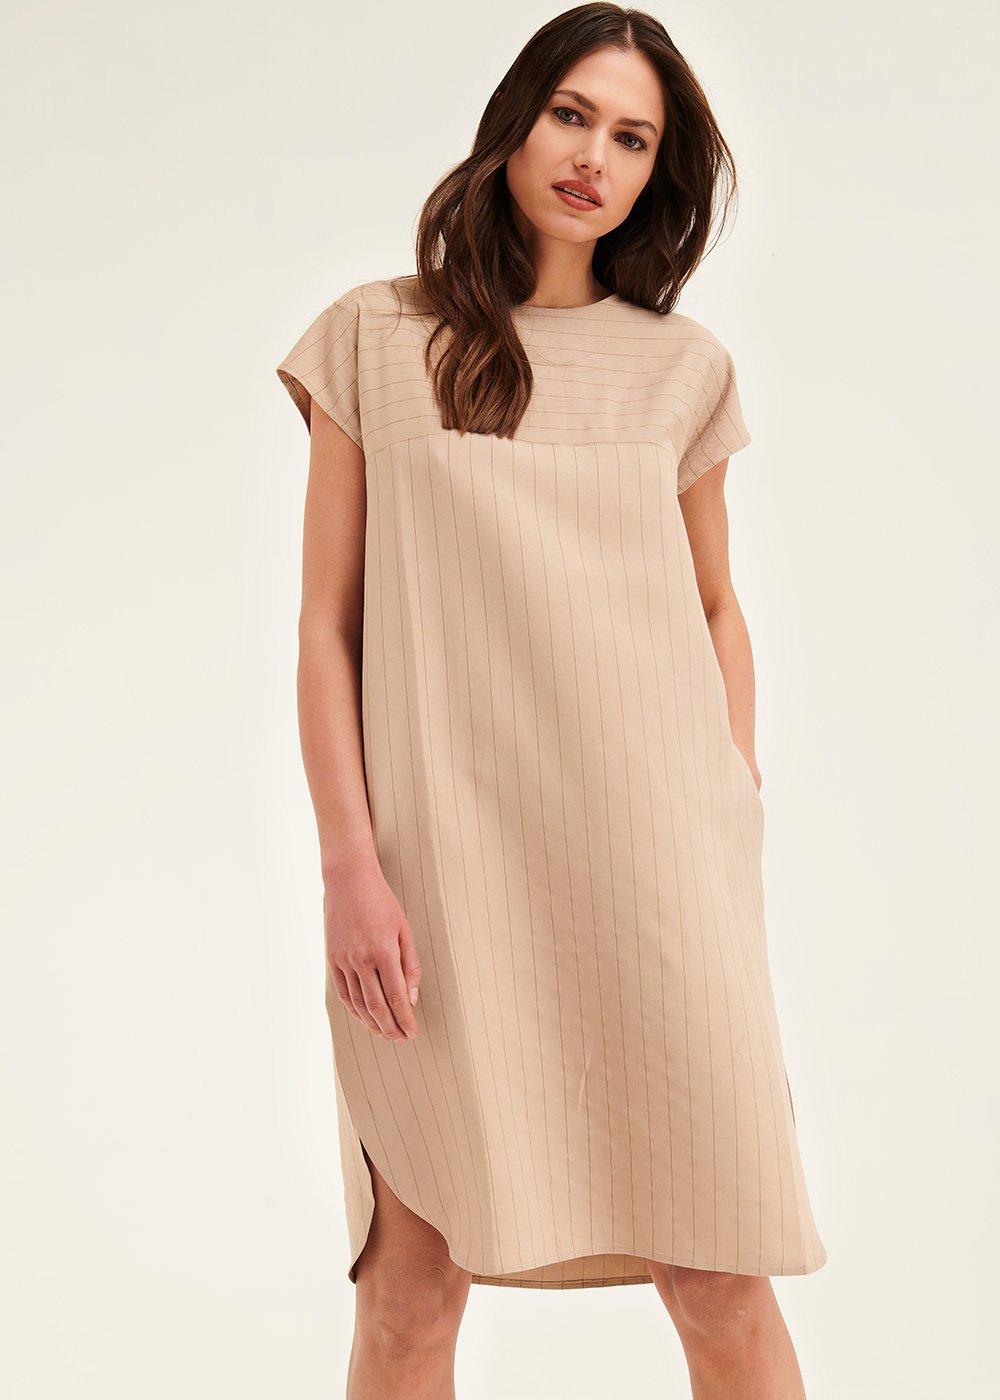 Avryl egg-shaped dress - Safari  / Black / Stripes - Woman